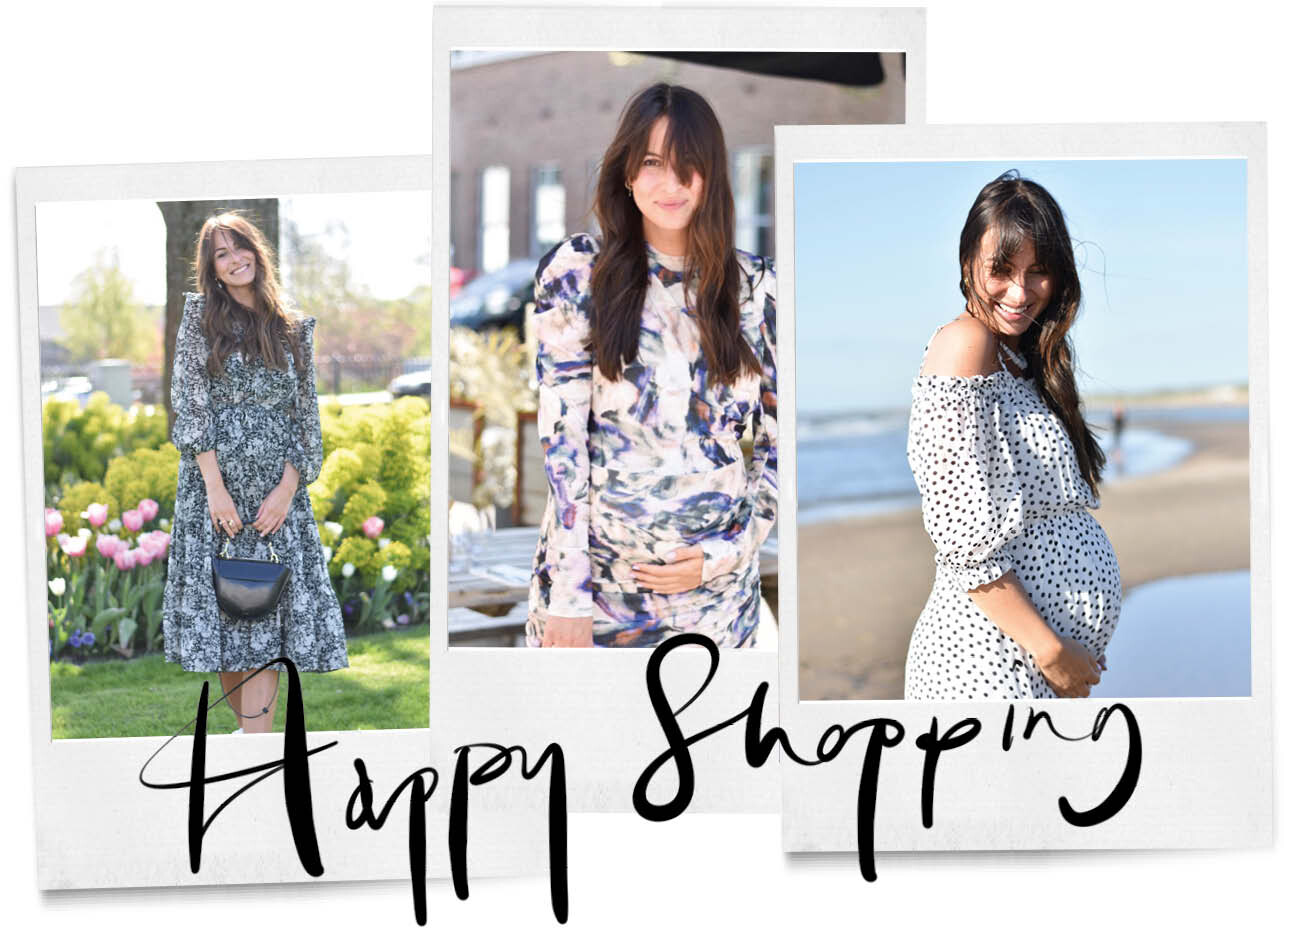 Om ASAP te shoppen: 18 x babybumpproof jurkjes